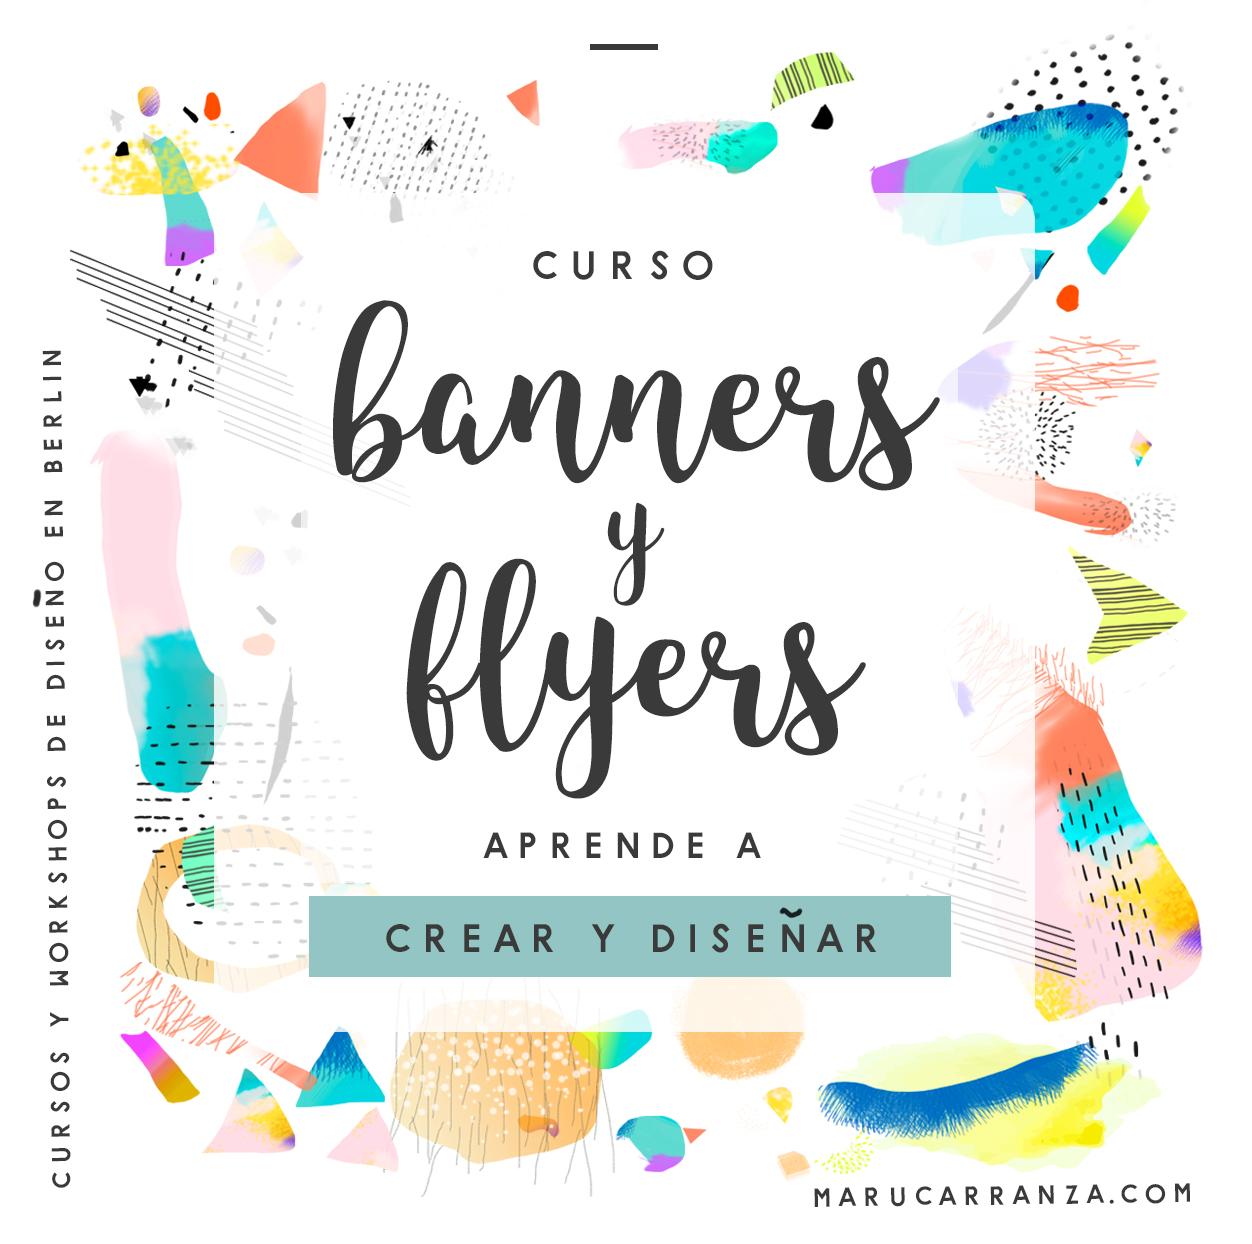 design-crea-banners-berlin-curso-espanol-marucarranza